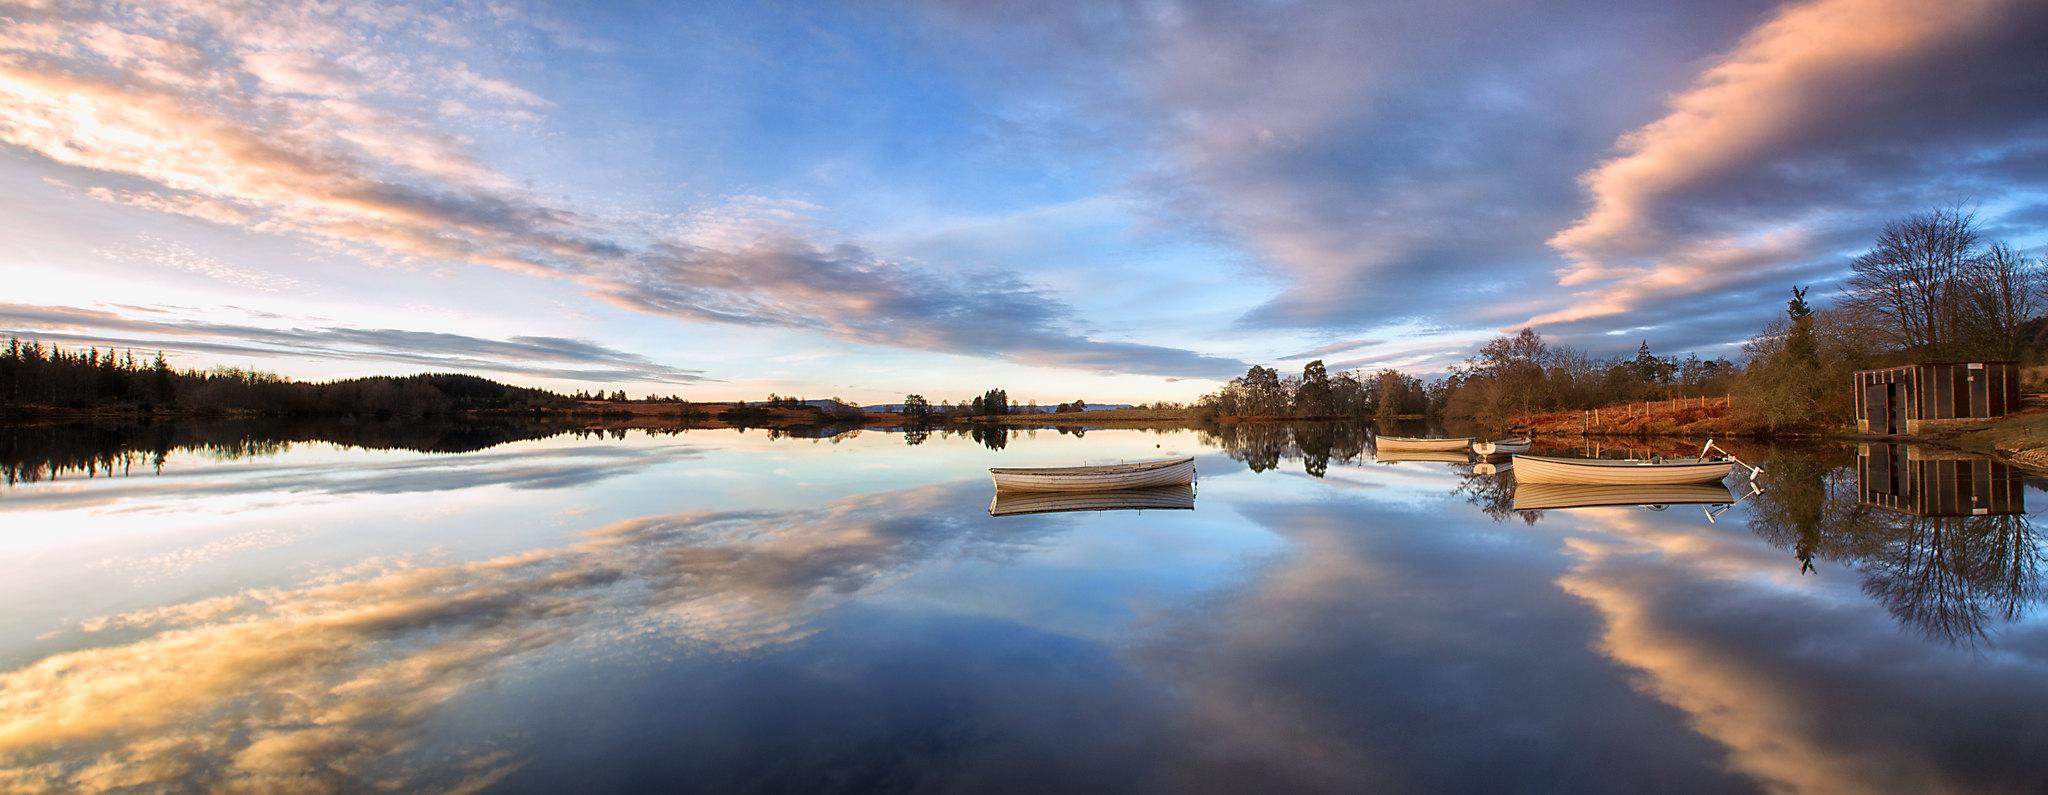 Loch an Rusgaidh, Trossachs, Scotland